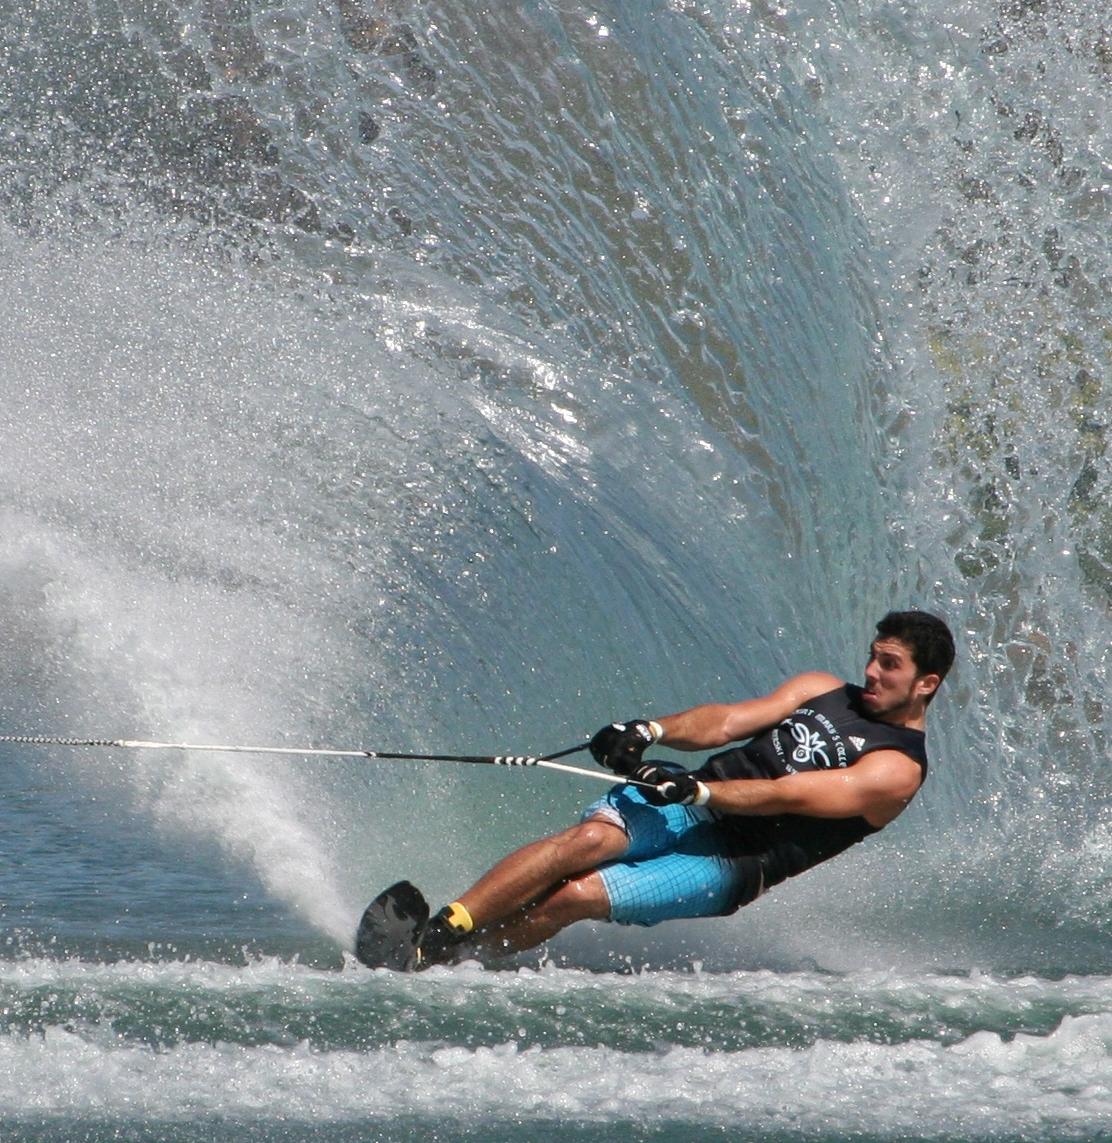 smc alum competes for water ski title